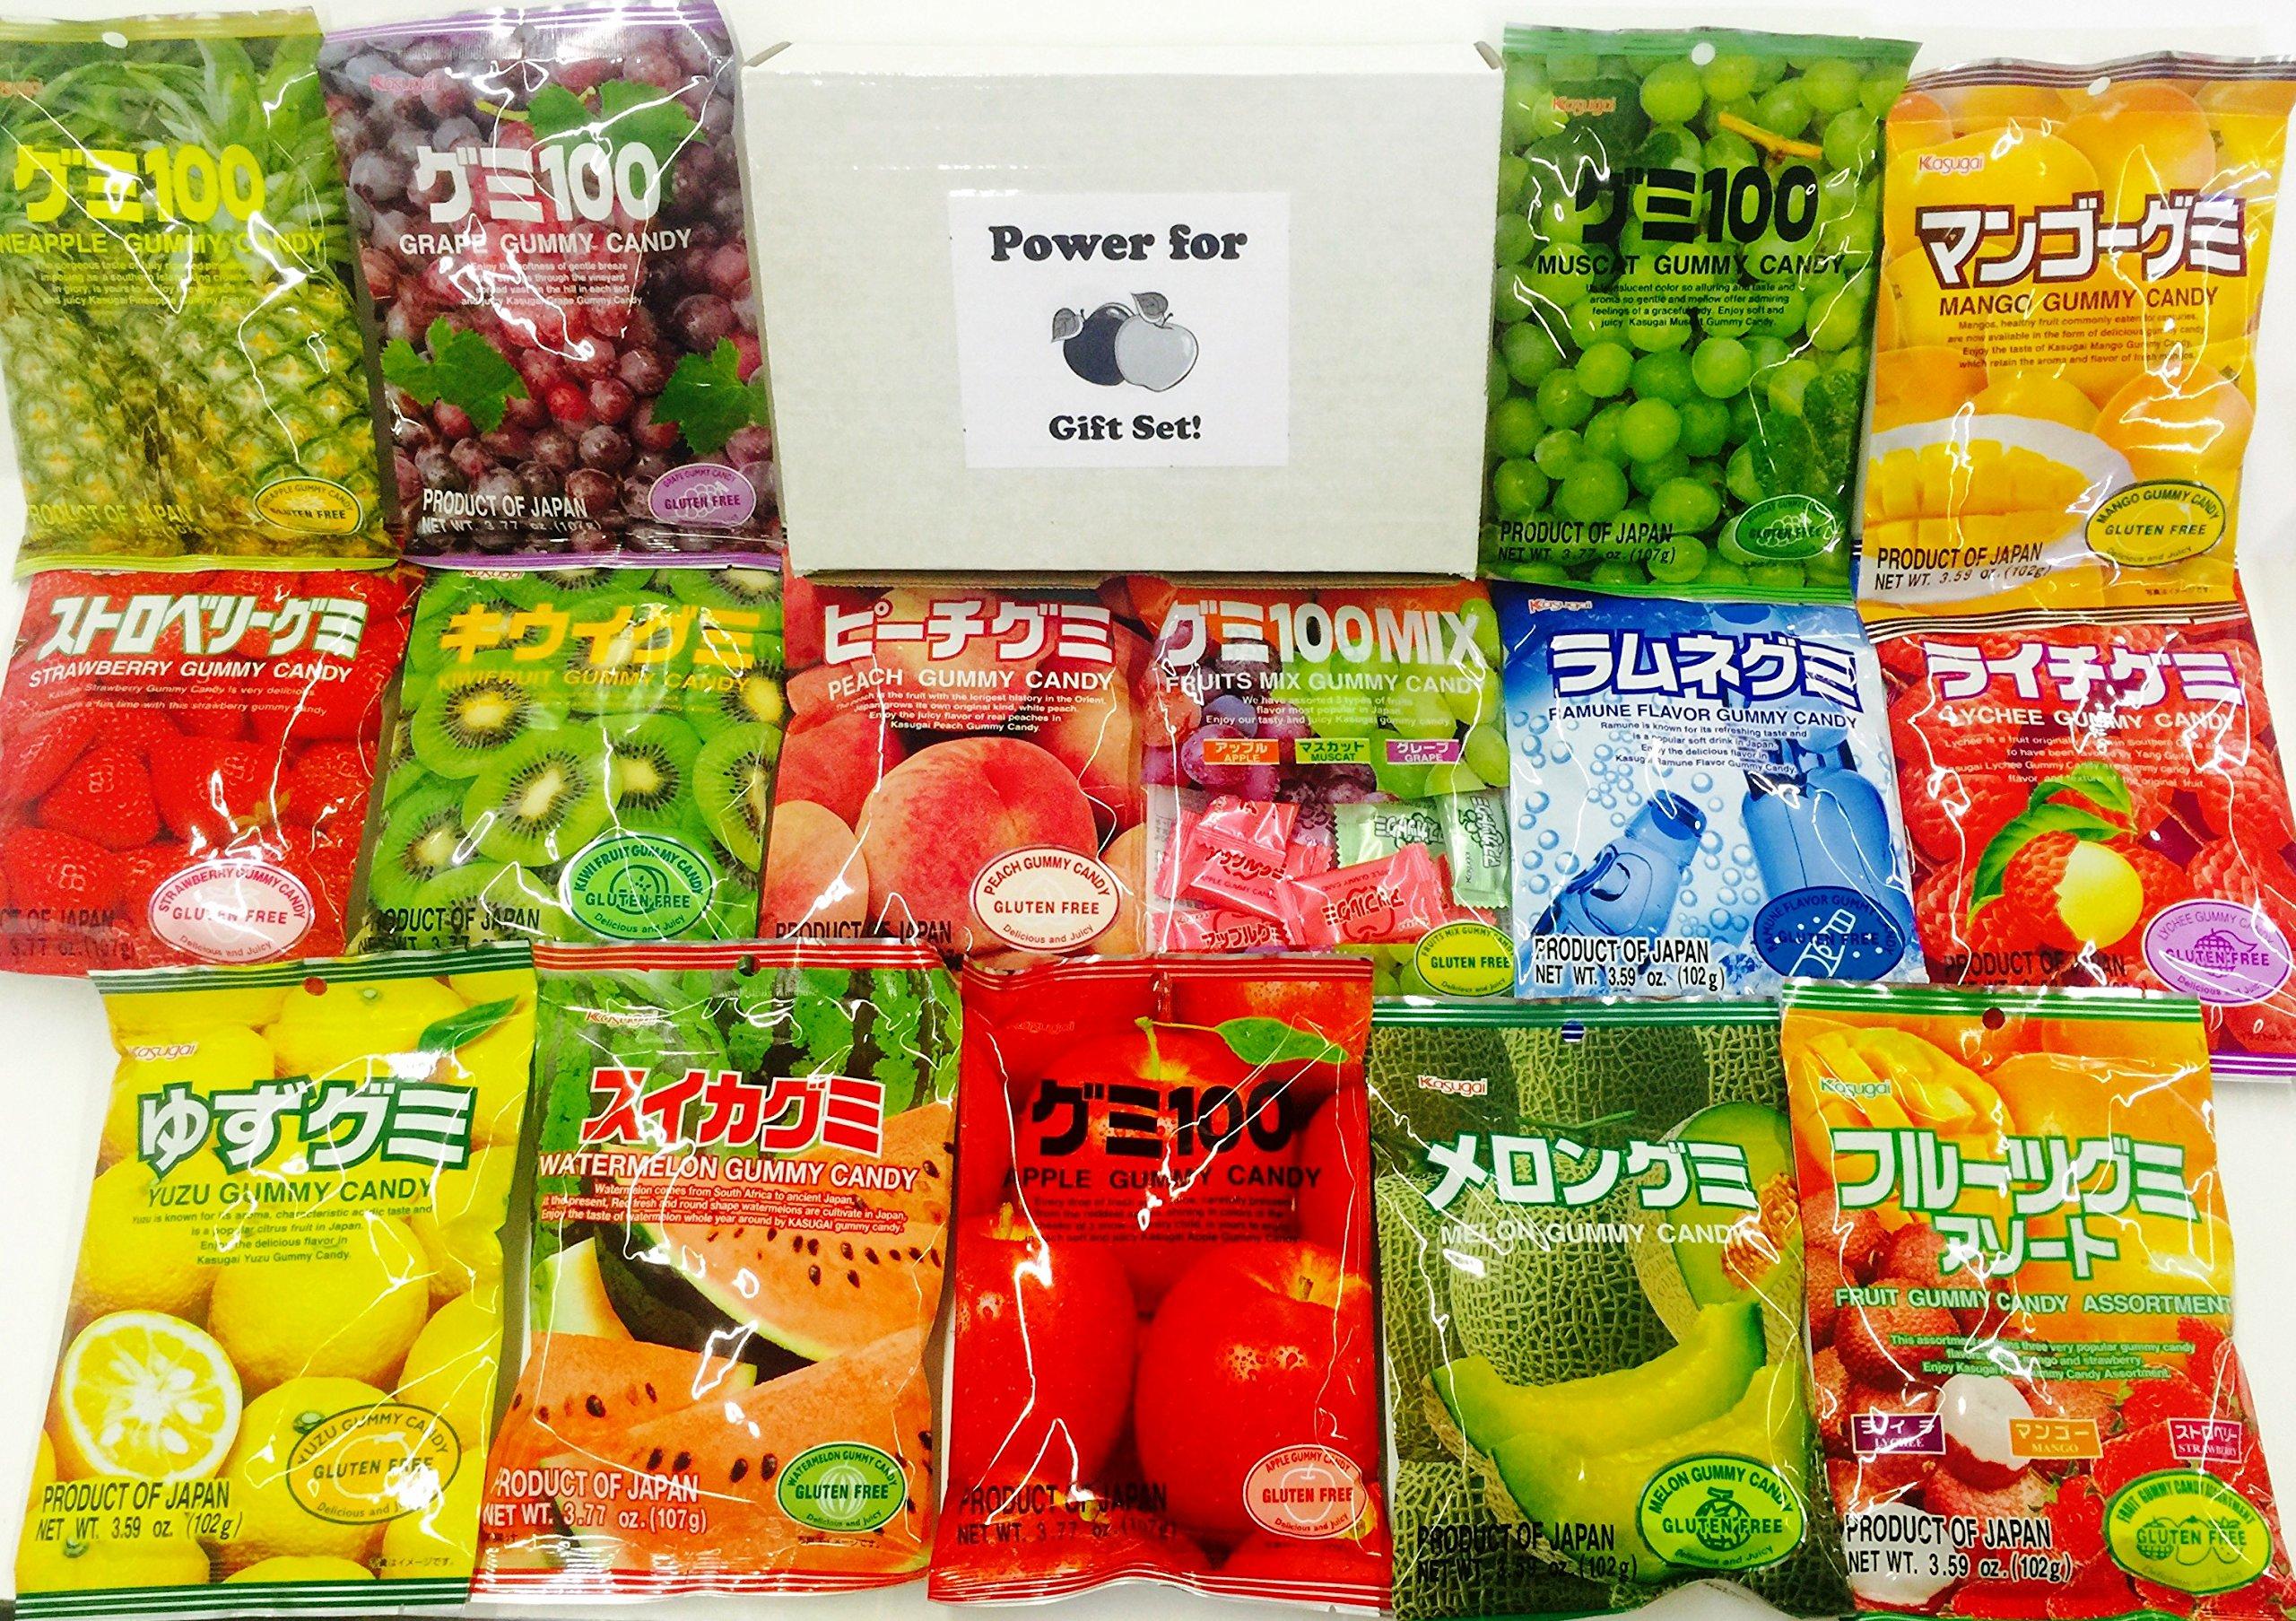 Kasugai Gummy Party Pack 15x3.59oz (15 Bags At least 12 Flavors), Lychee, Mango, Peach, Strawberry, Grape, Kiwi, Melon, Pinapple, Apple, Watermelon, Lemon, Ramune, and More!